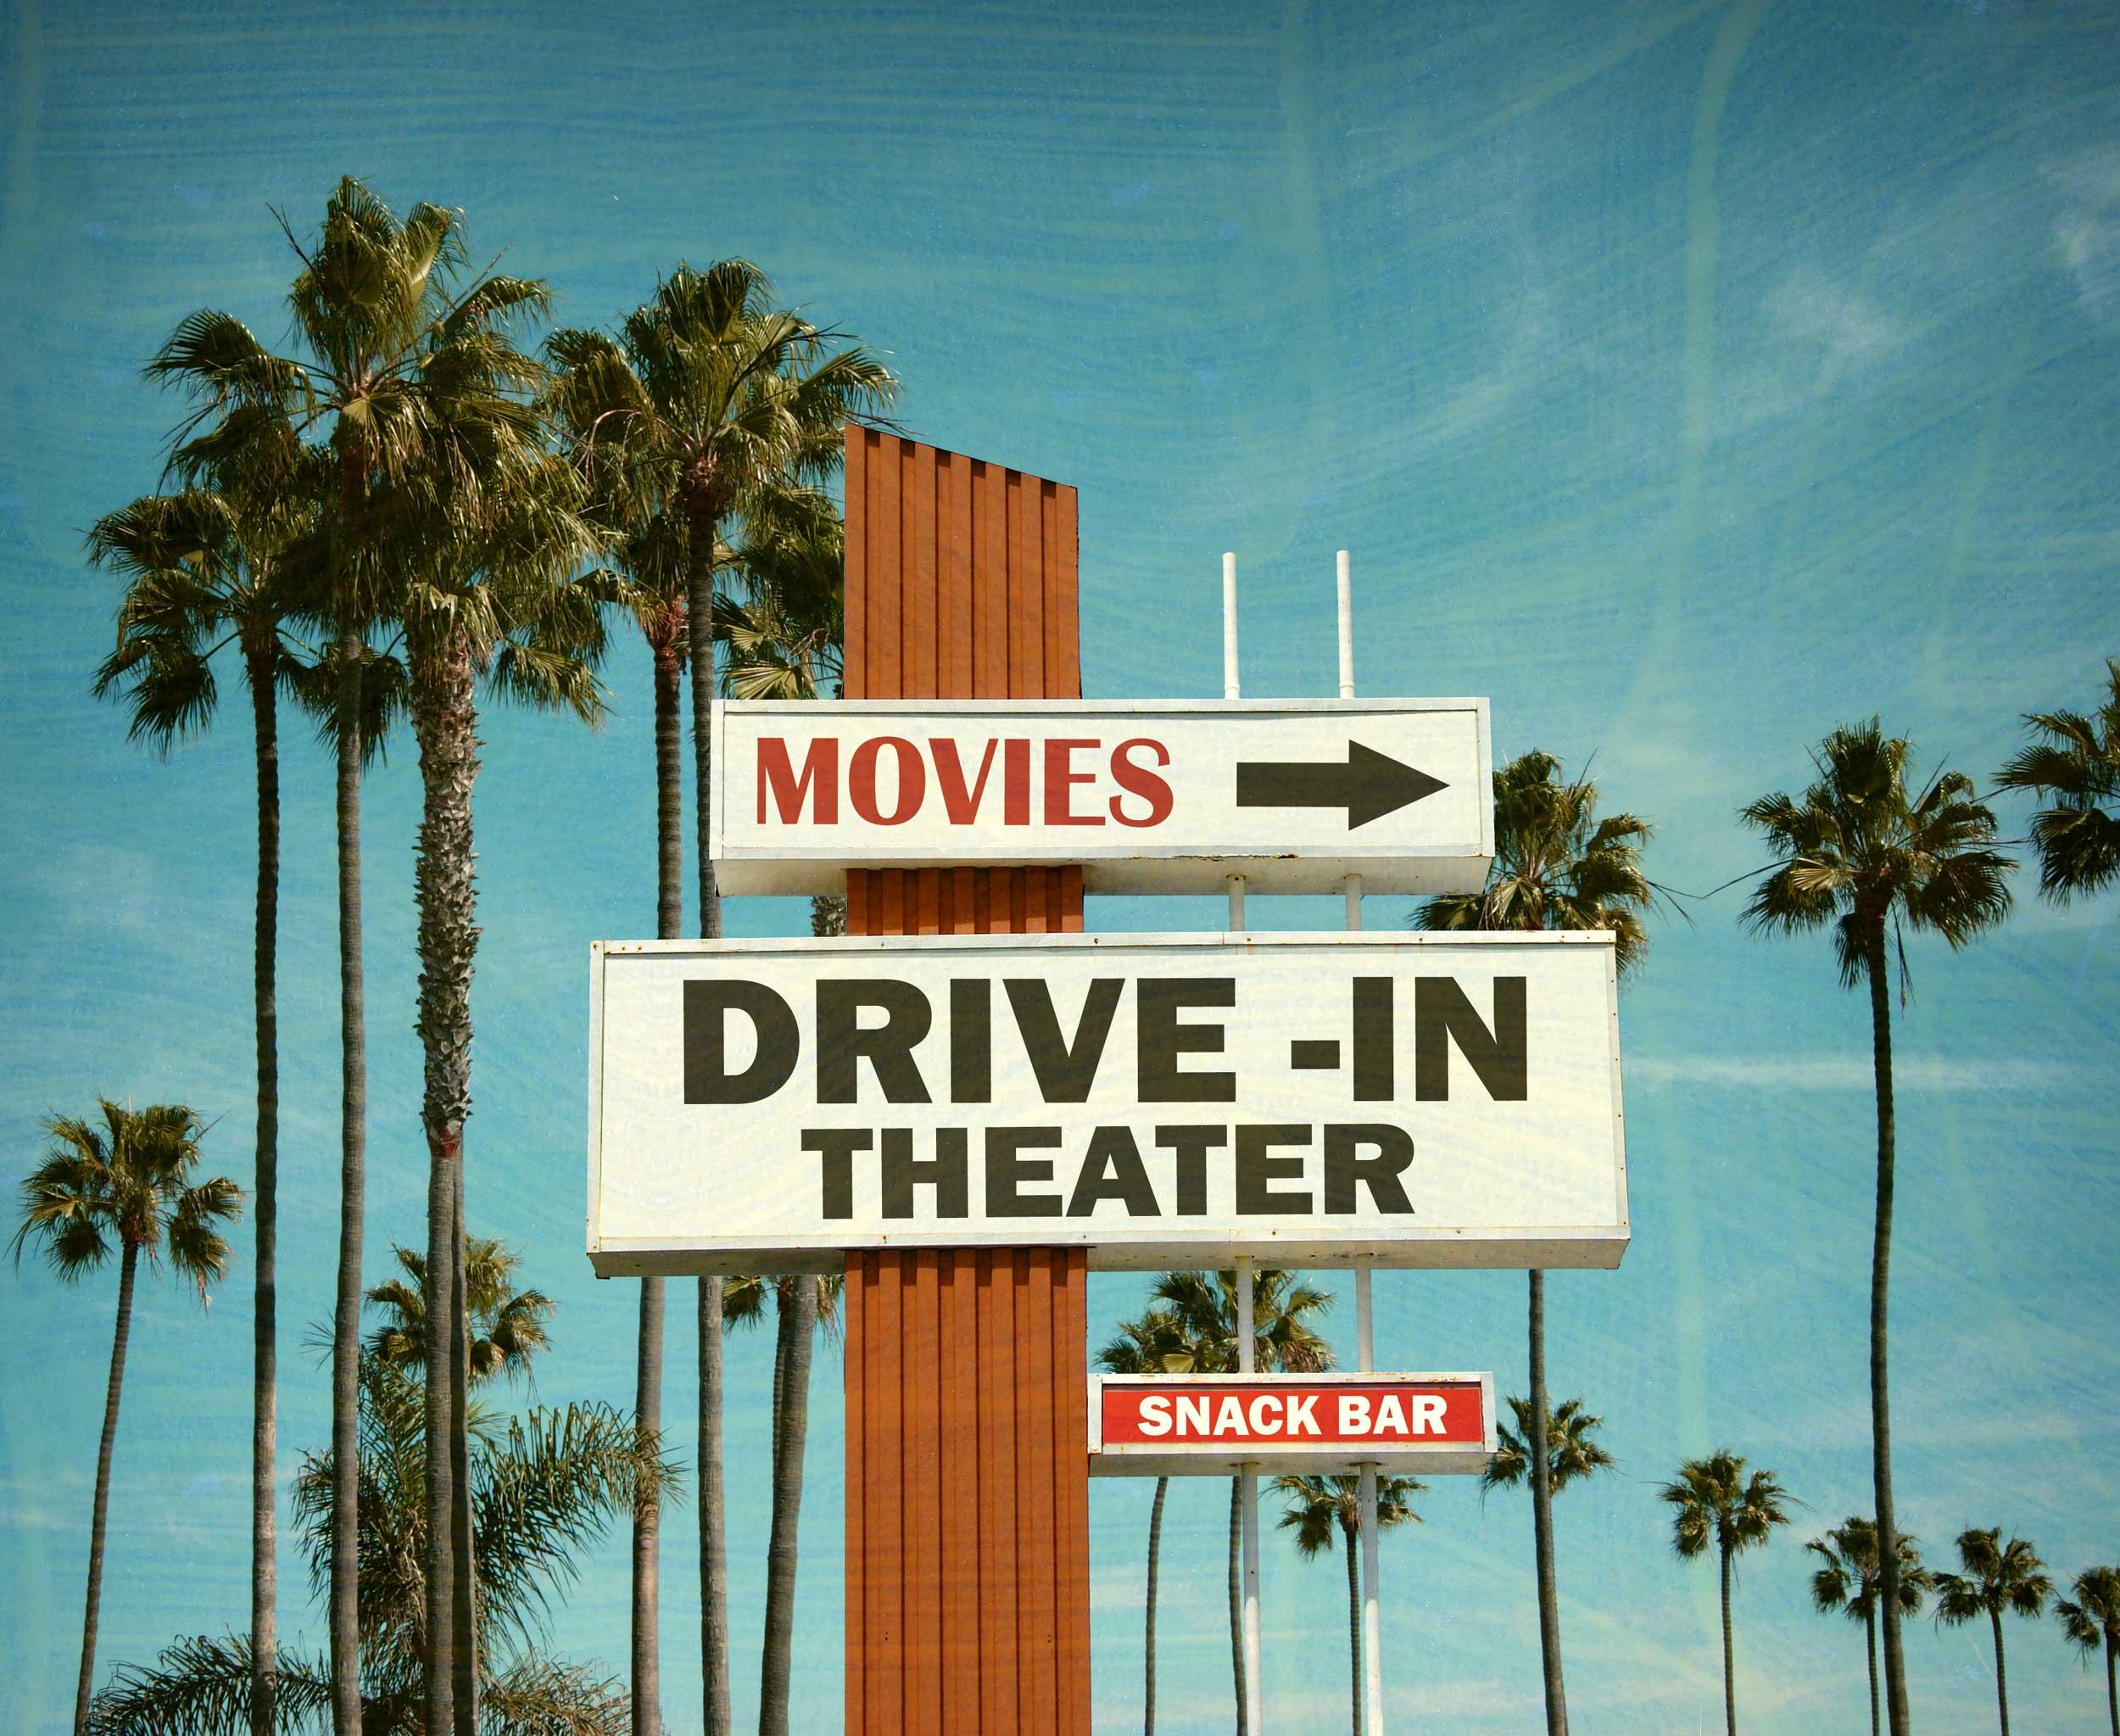 Drive in Cinema Sign, cinema hire, screen hire, pop up cinema hire, outdoor cinema hire, indoor cinema hire, projector hire